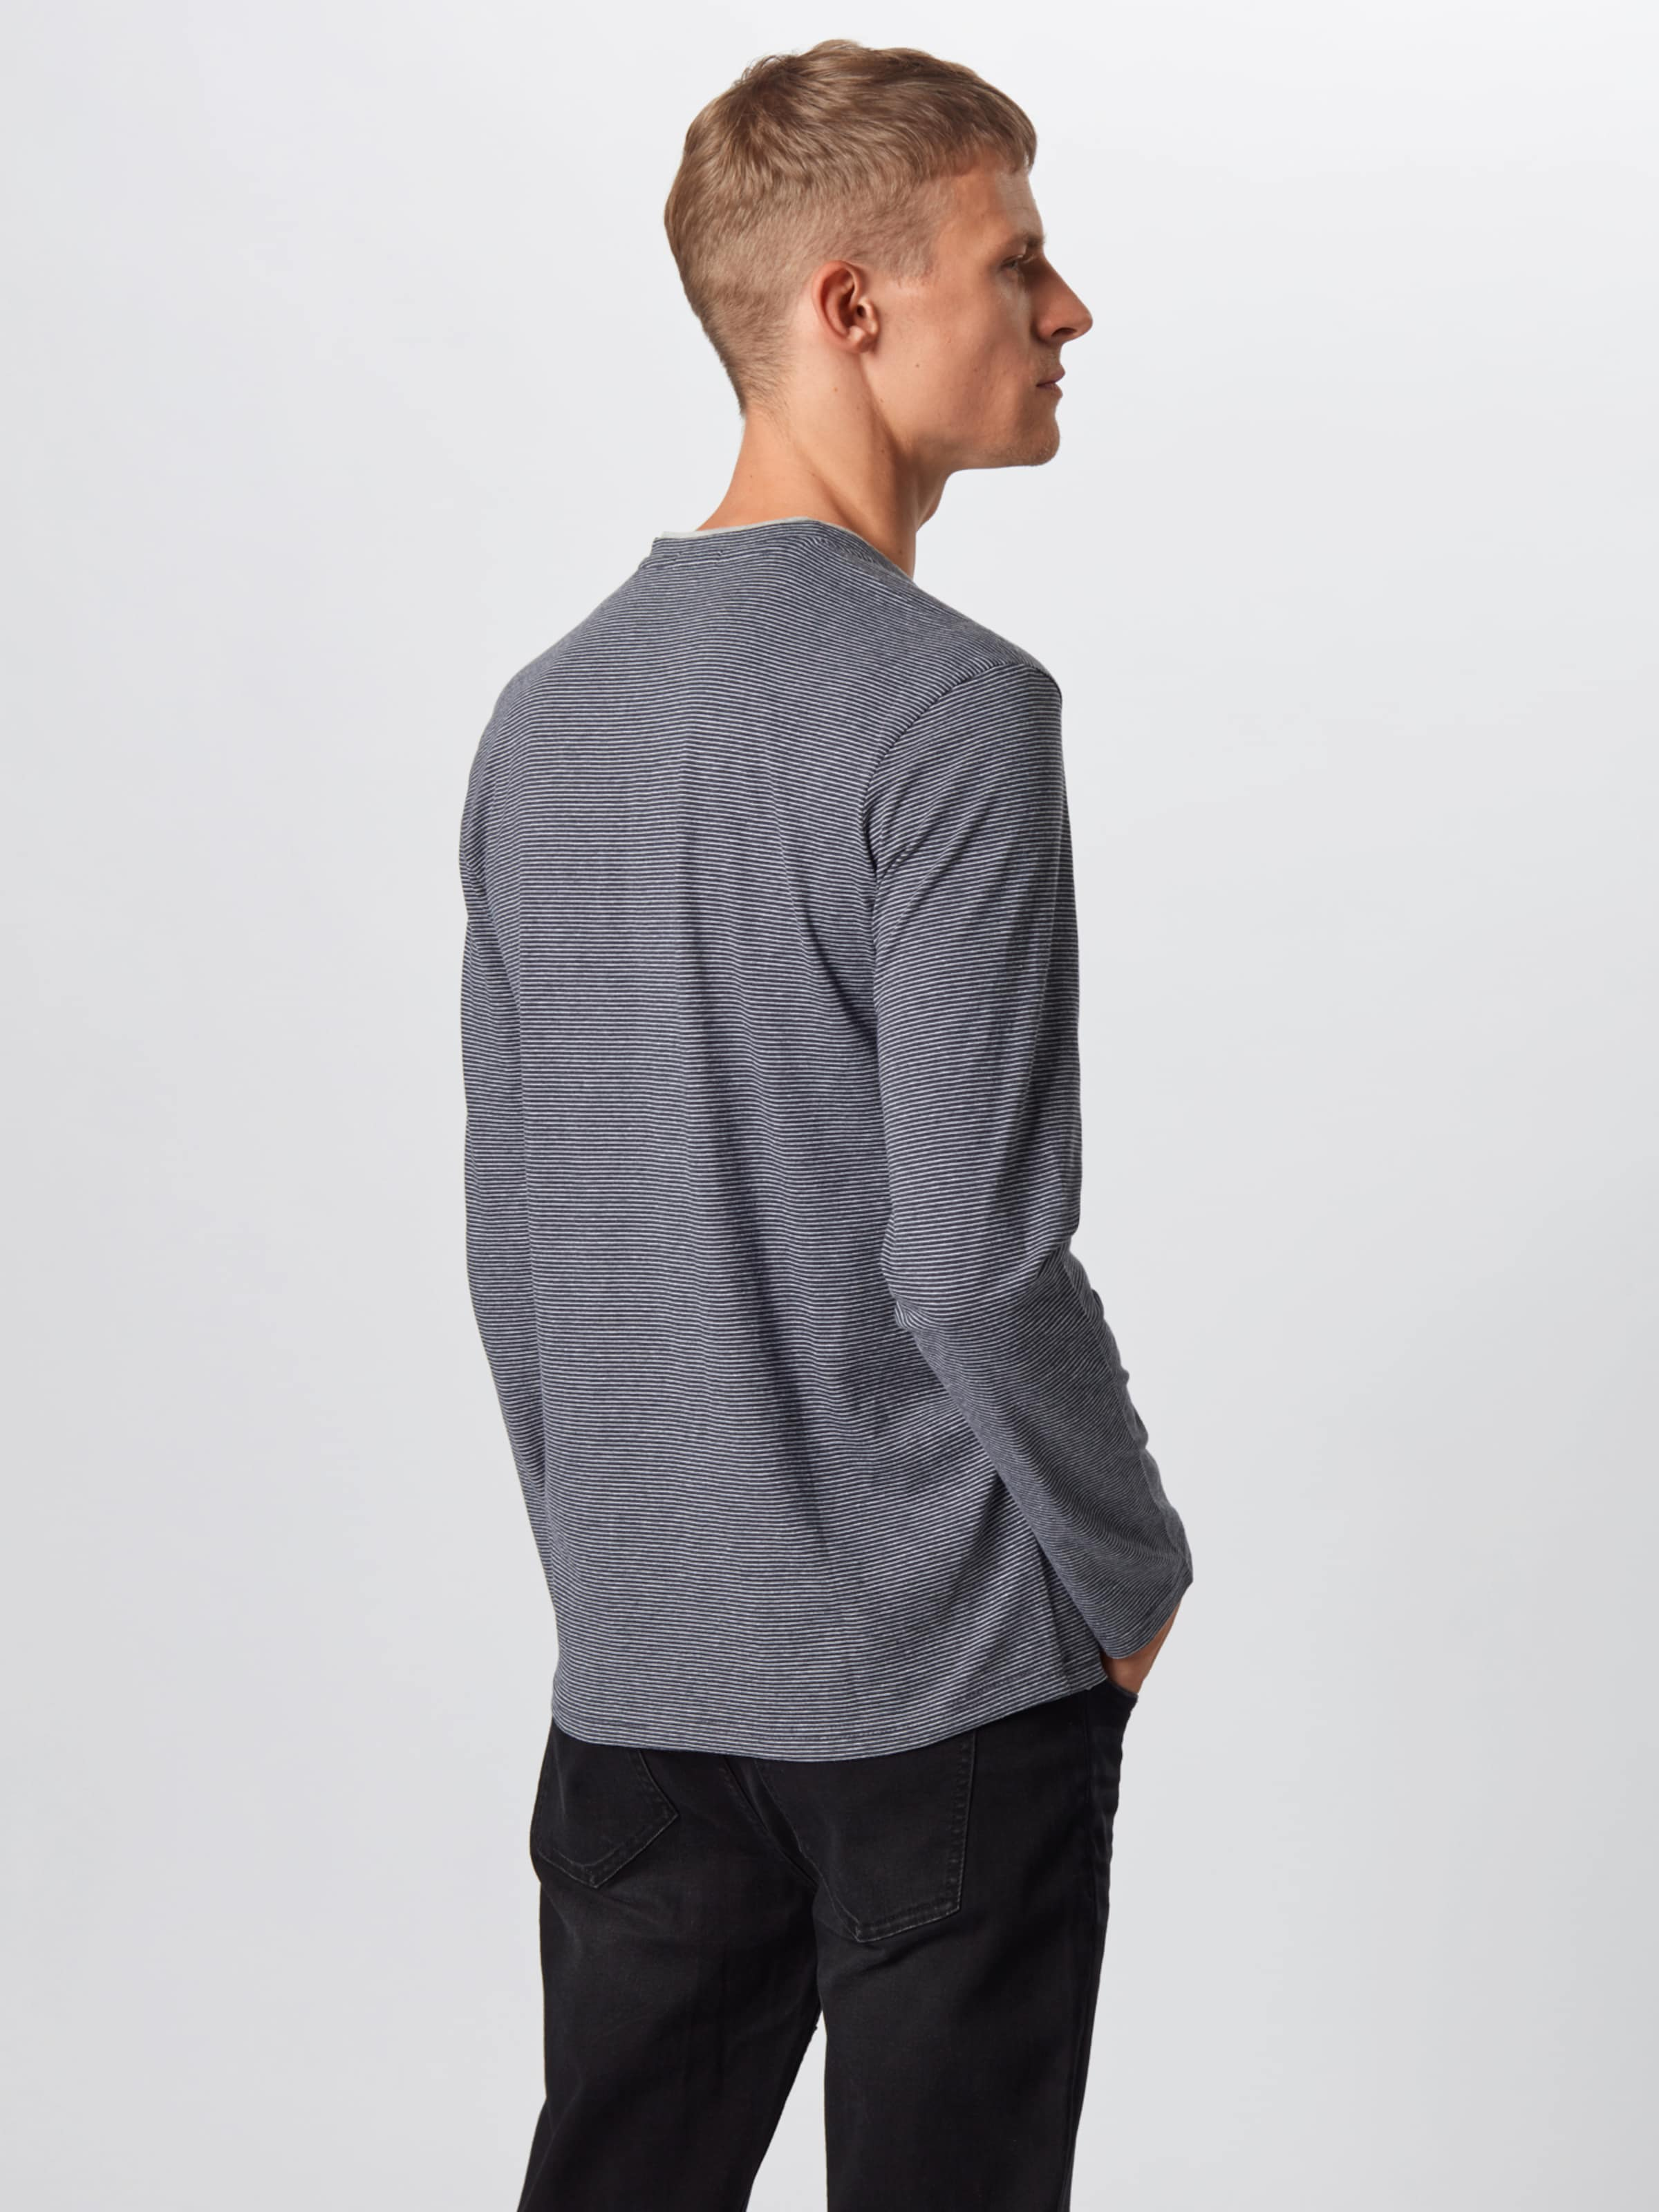 En Tailor T shirt Tom Gris BasalteBlanc lK1FJc